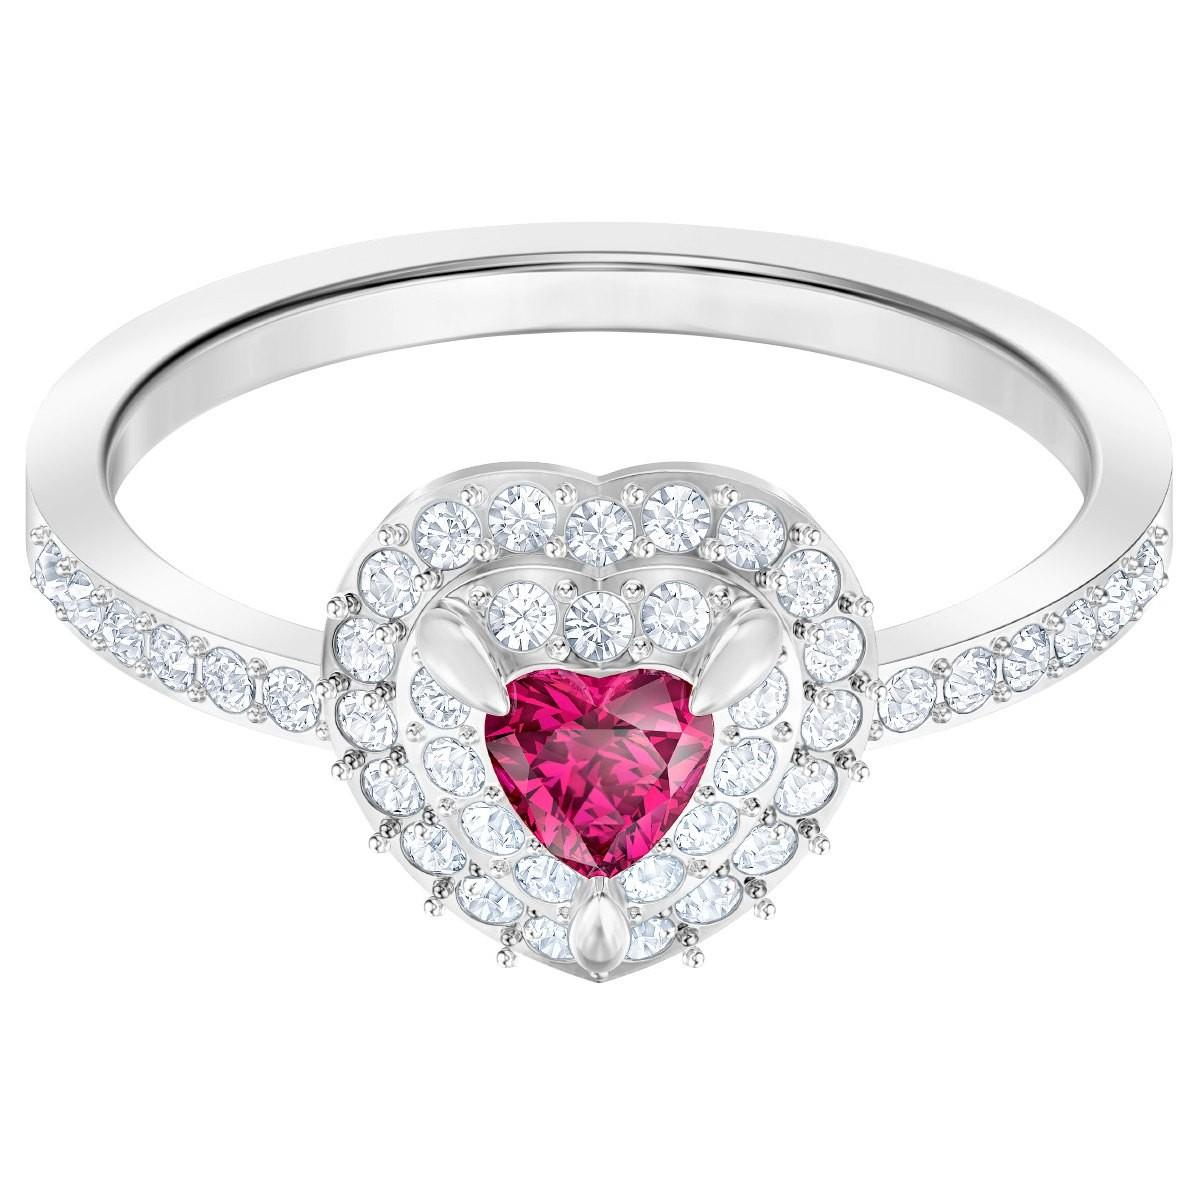 Swarovski 5446300 Ring One zilverkleurig-rood Maat 55